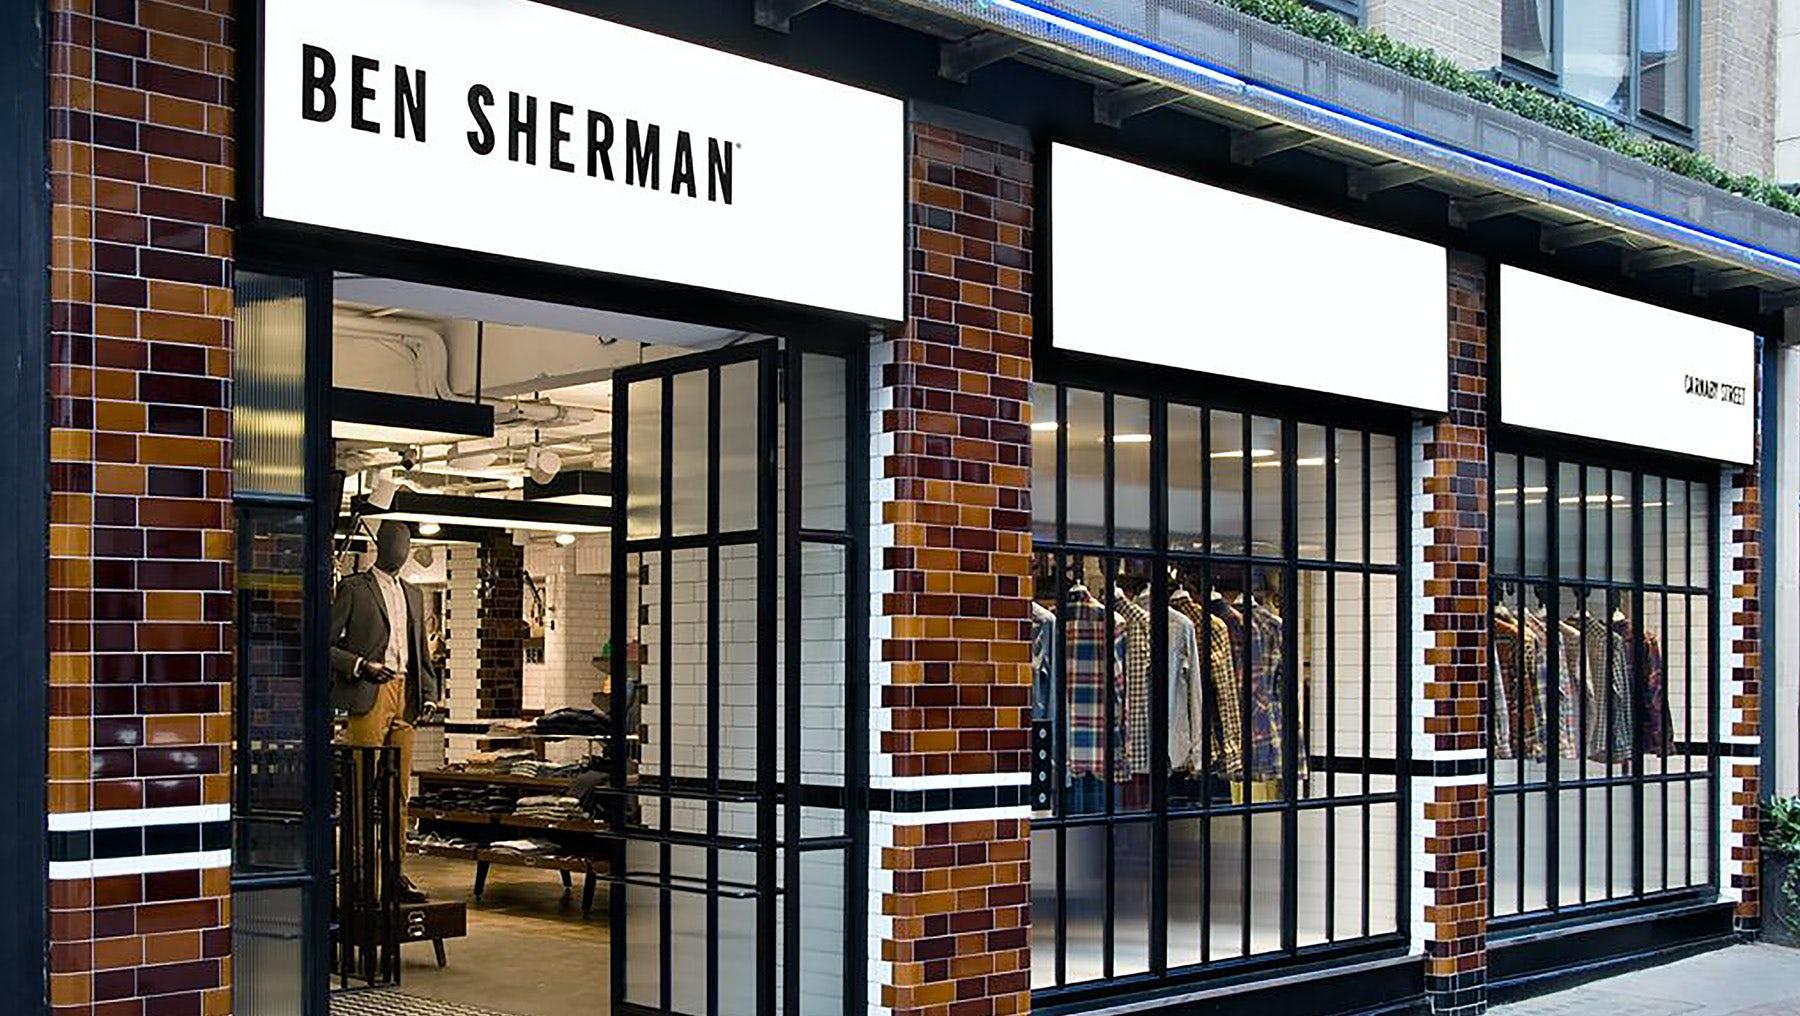 Ben Sherman Scores Olympic Deal